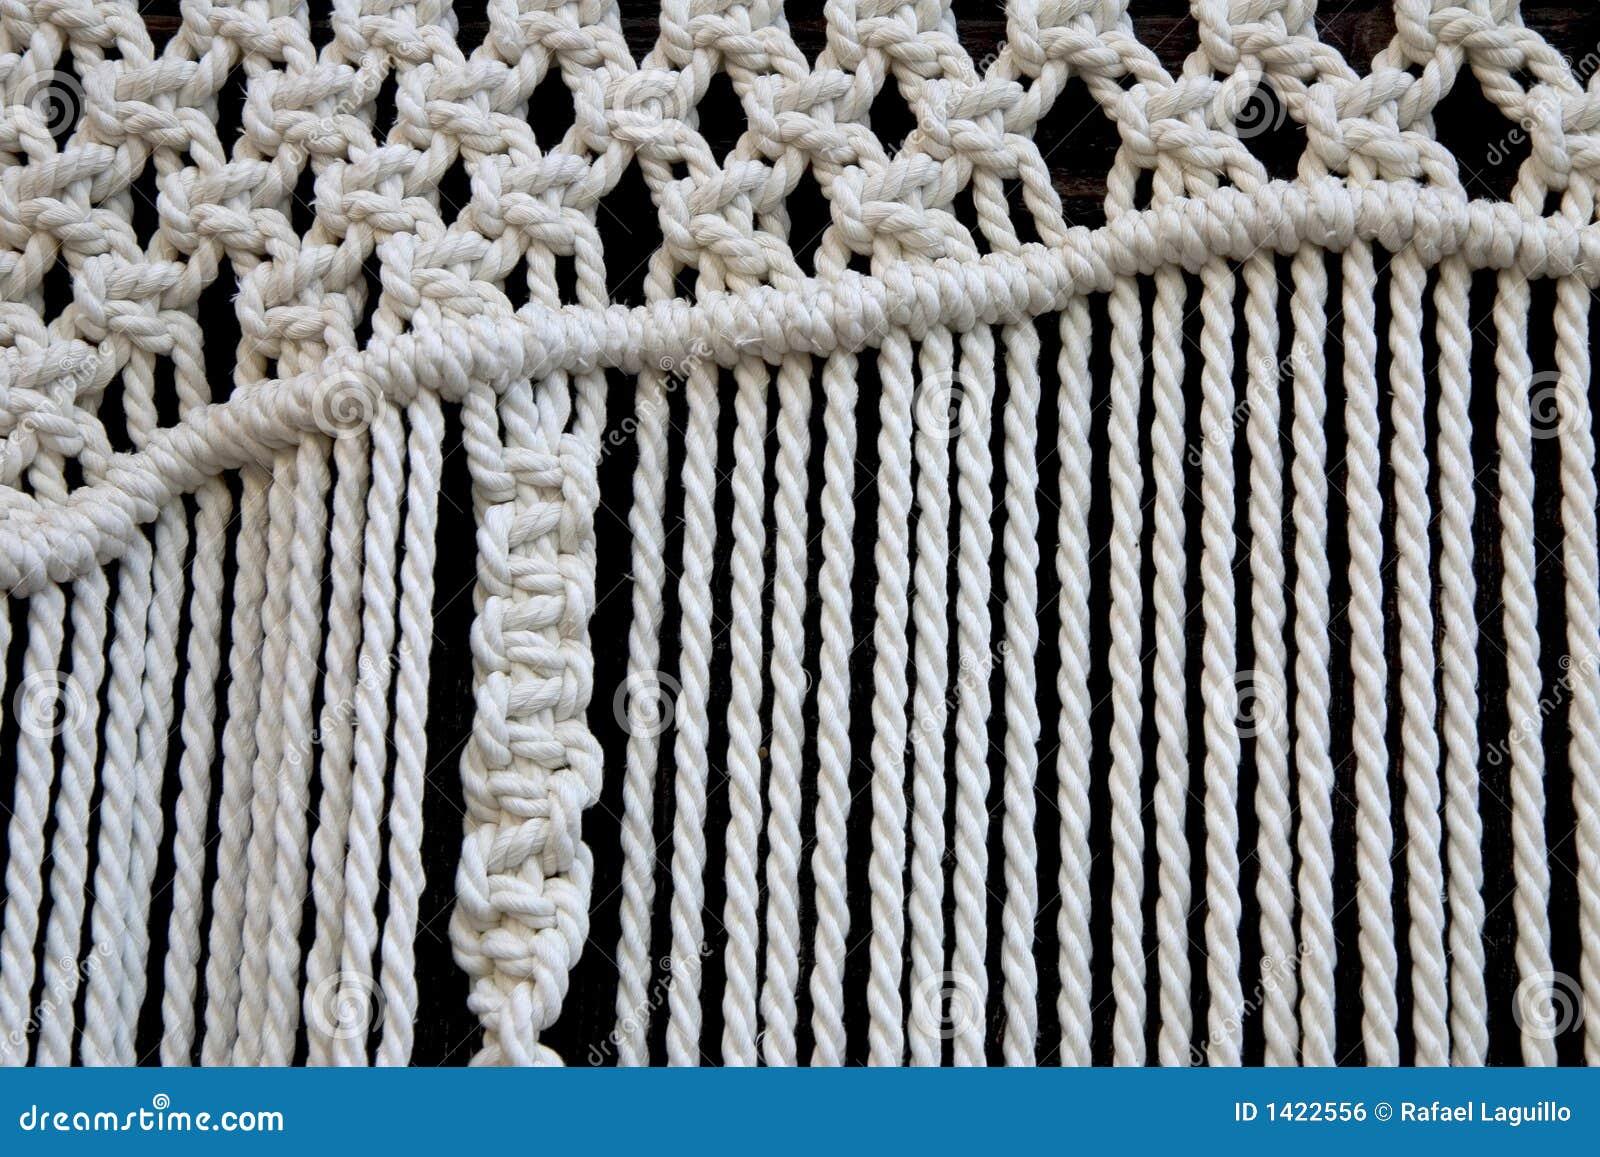 Macrame curtain detail stock photo  Image of intertwine